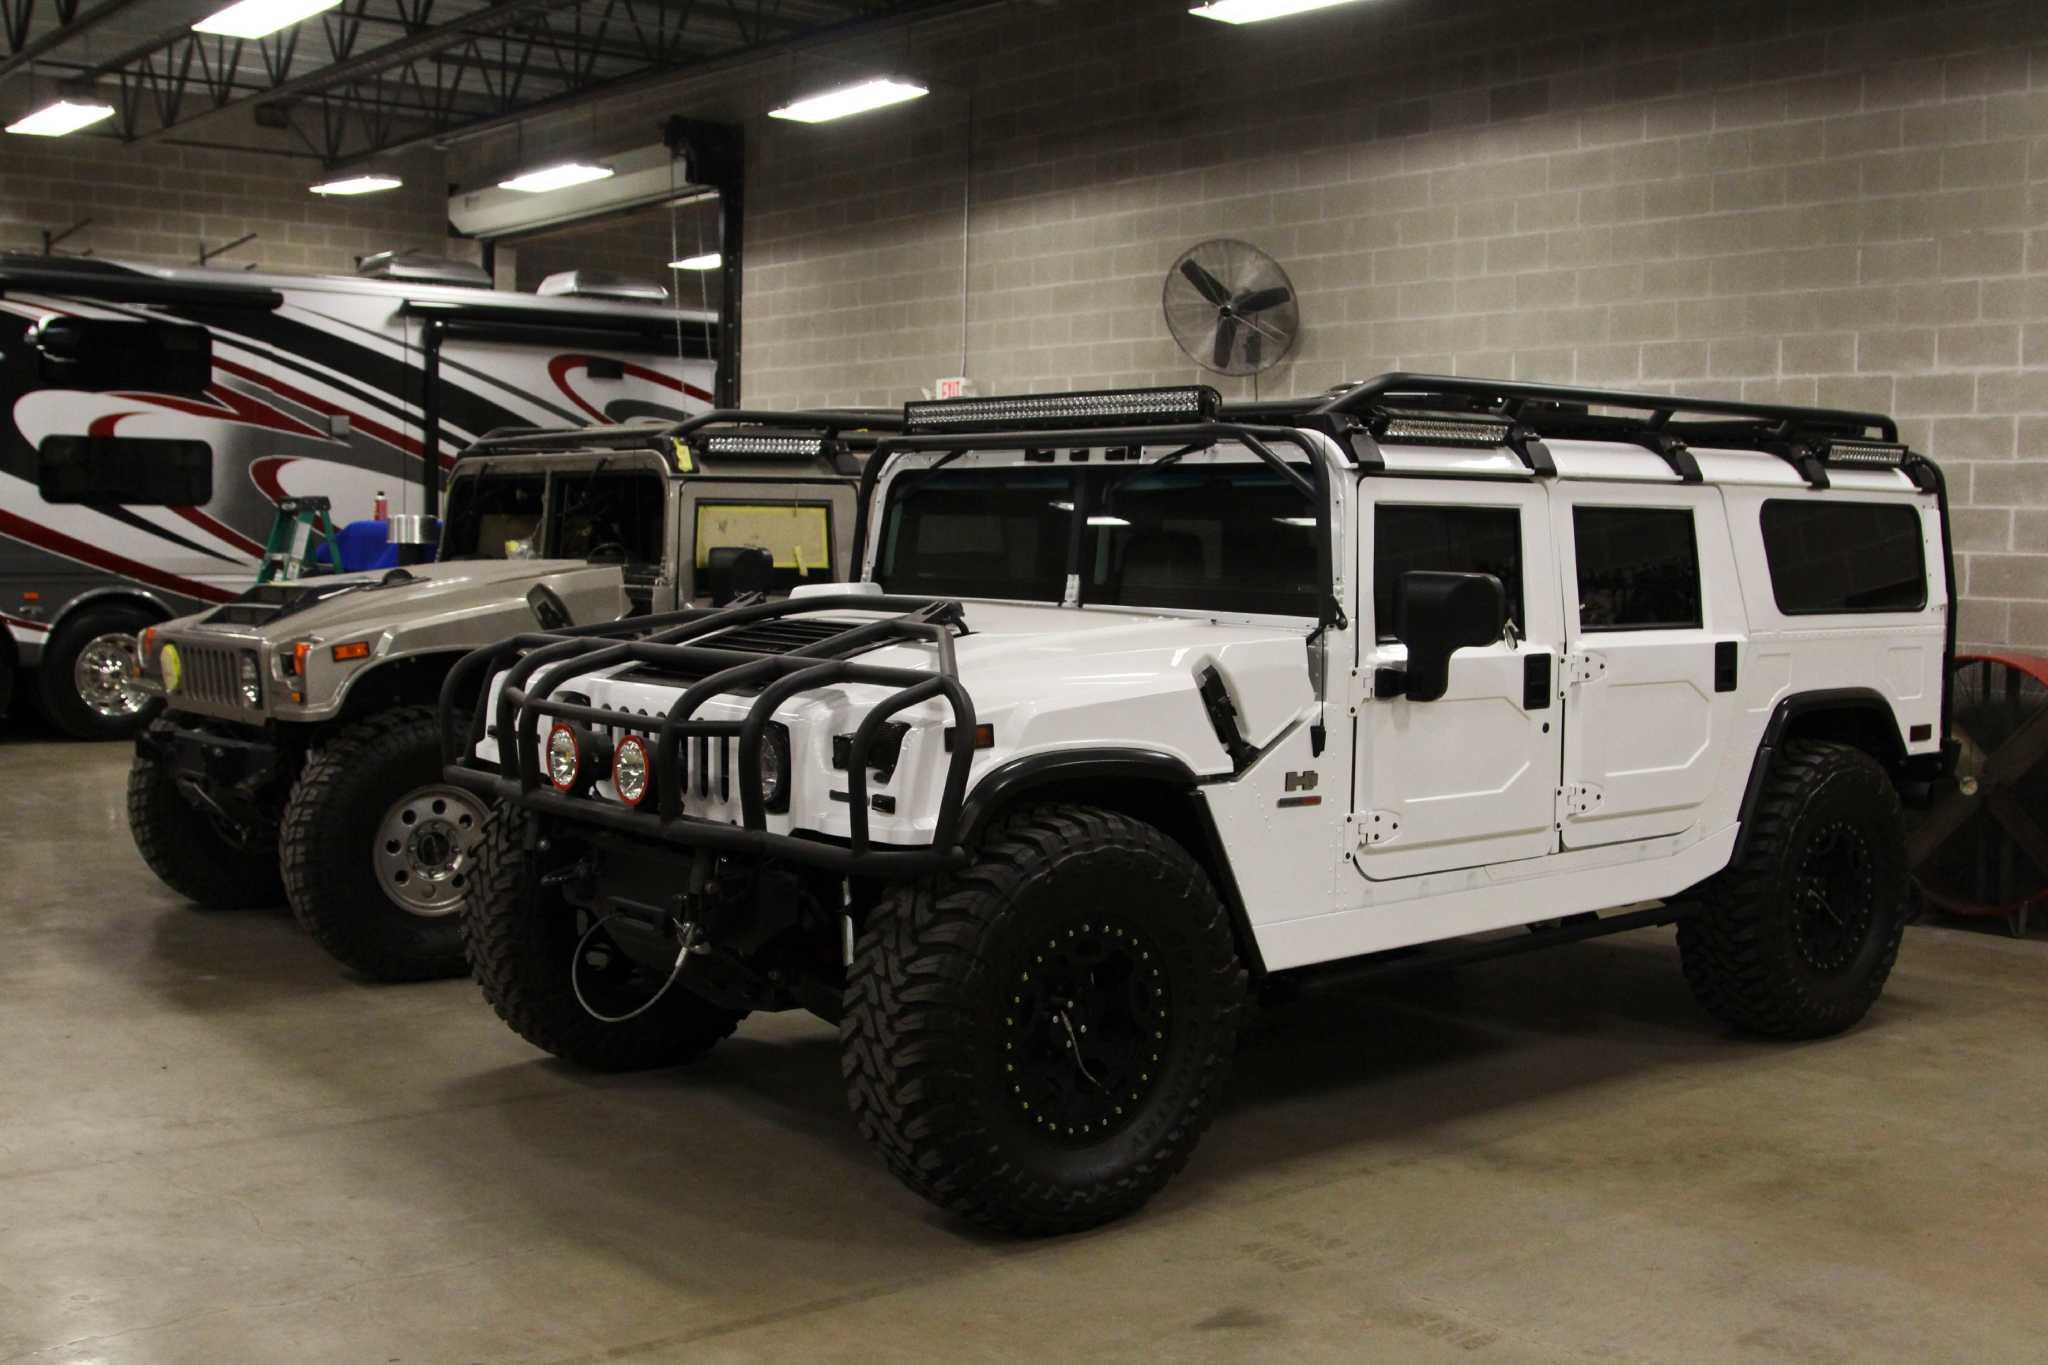 Luxury Armored Vehicles: San Antonio Luxury Armored Car Company Sales Up Following